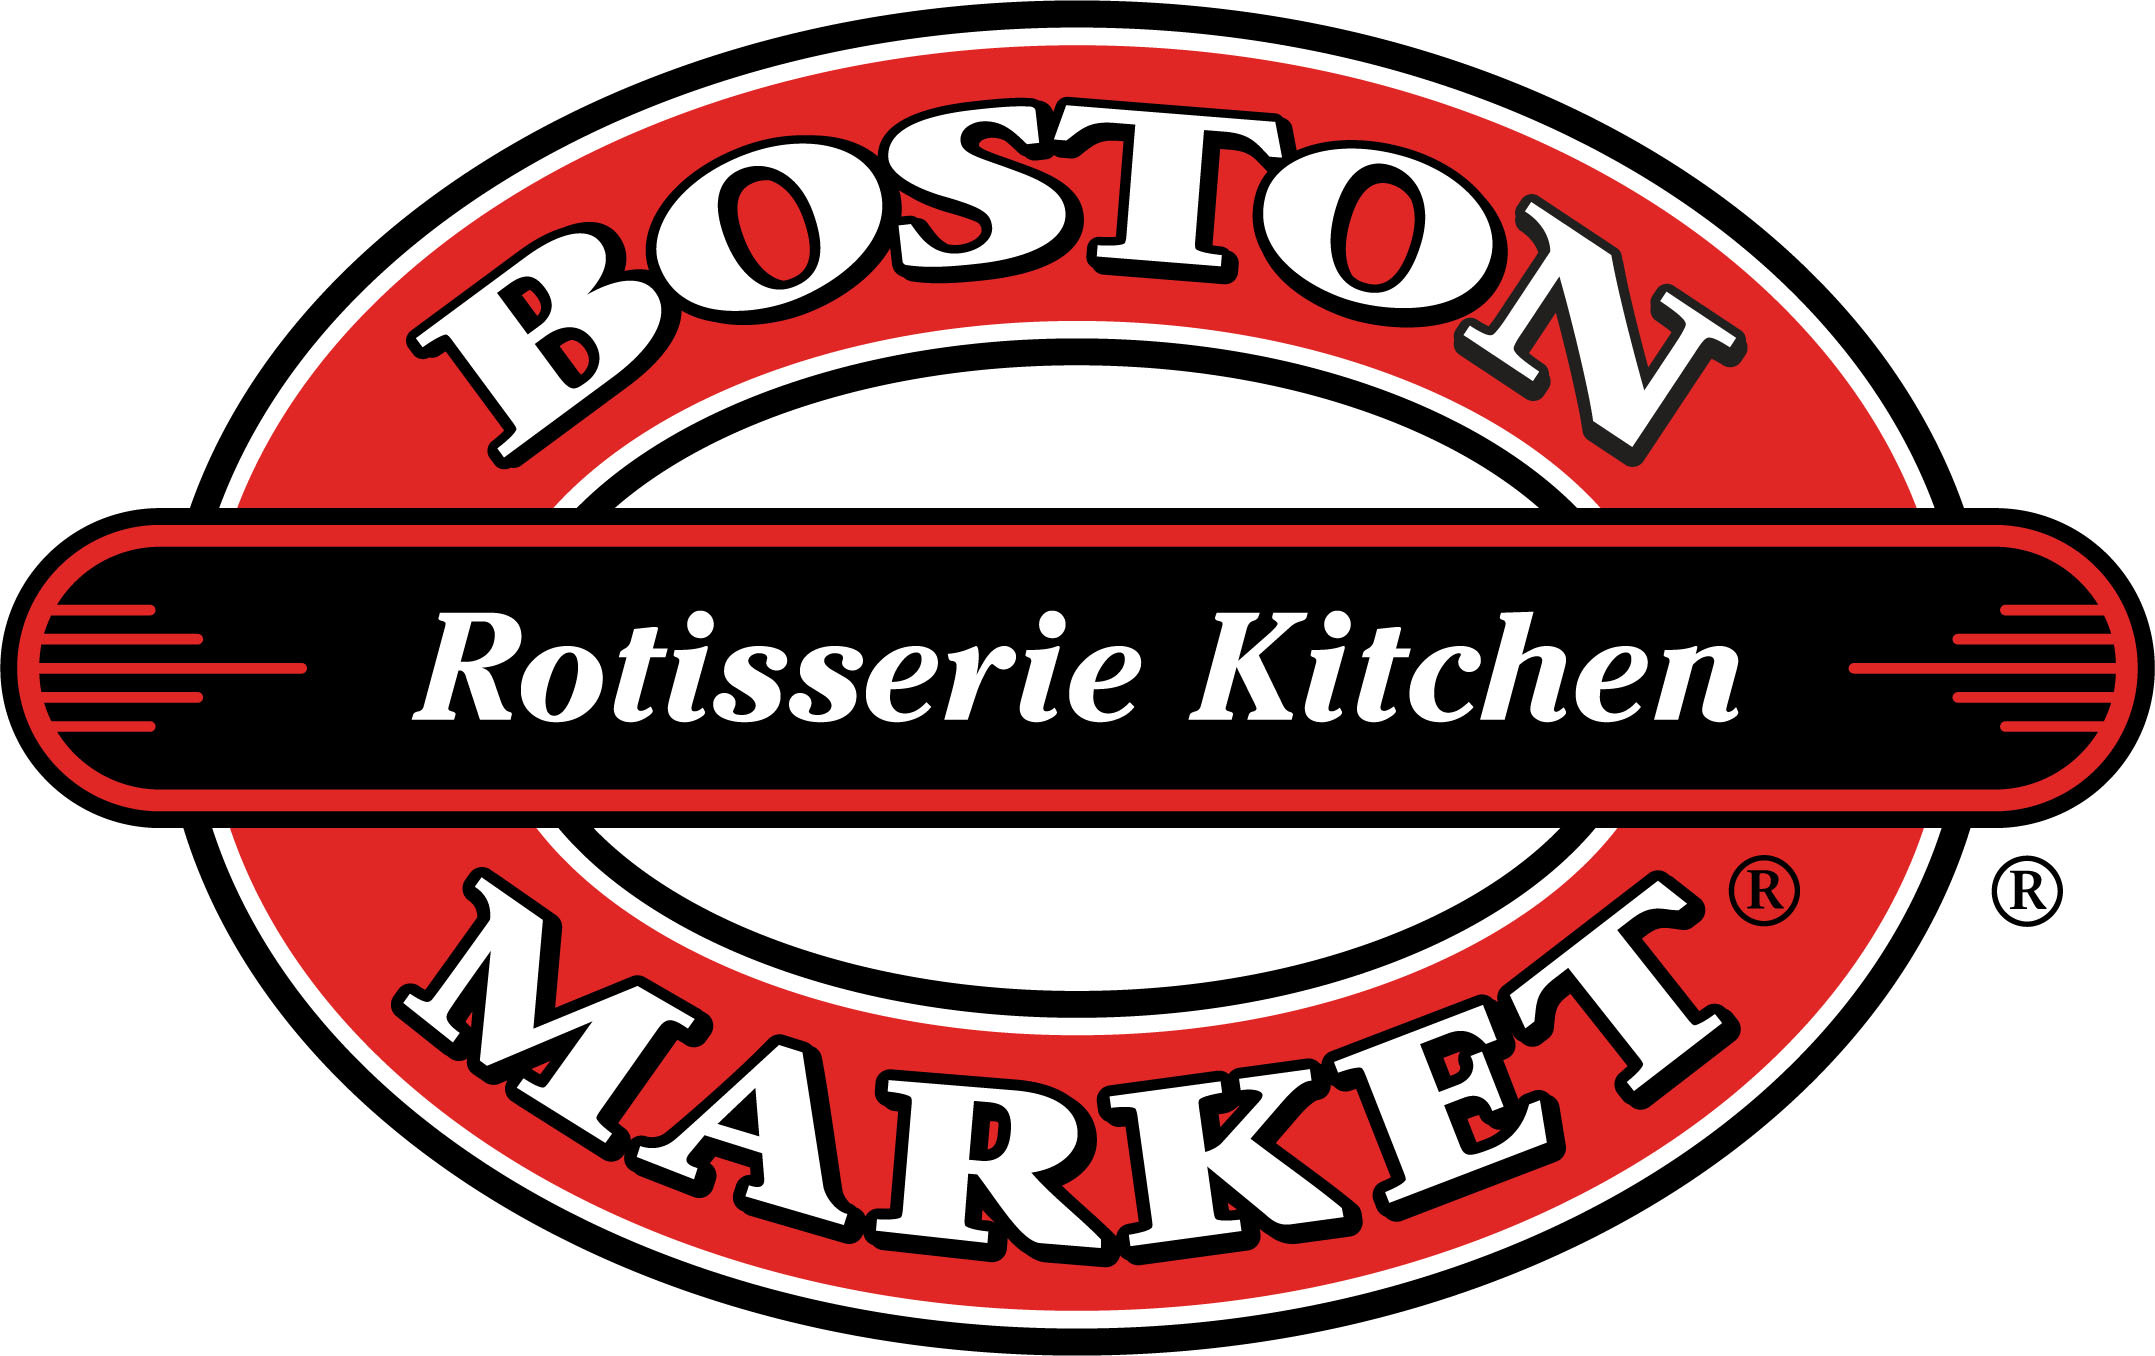 (PRNewsfoto/Boston Market)